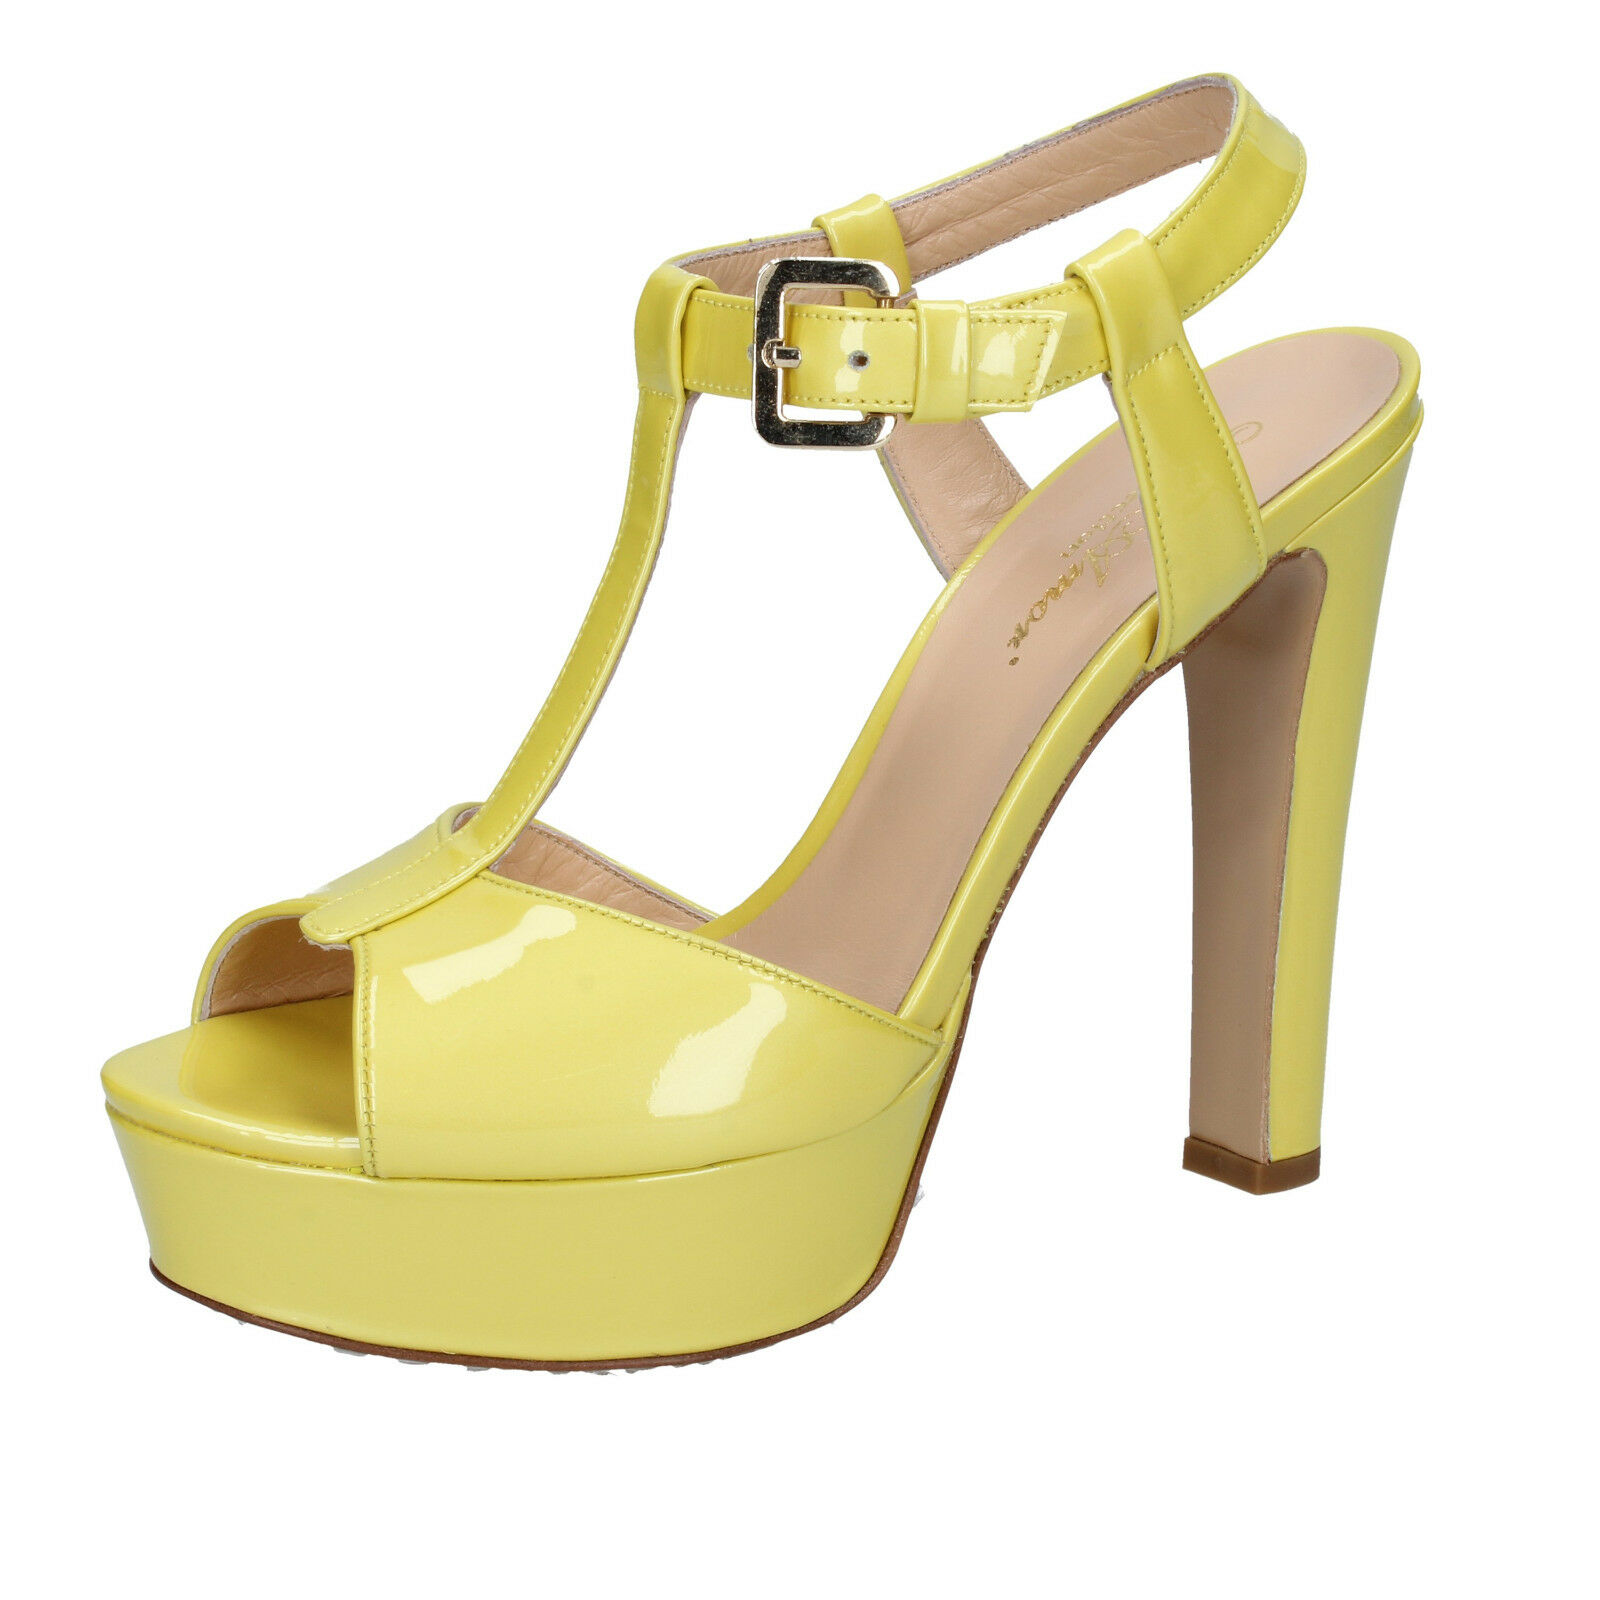 Scarpe donna MI AMOR 41 EU sandali giallo vernice BY164-F